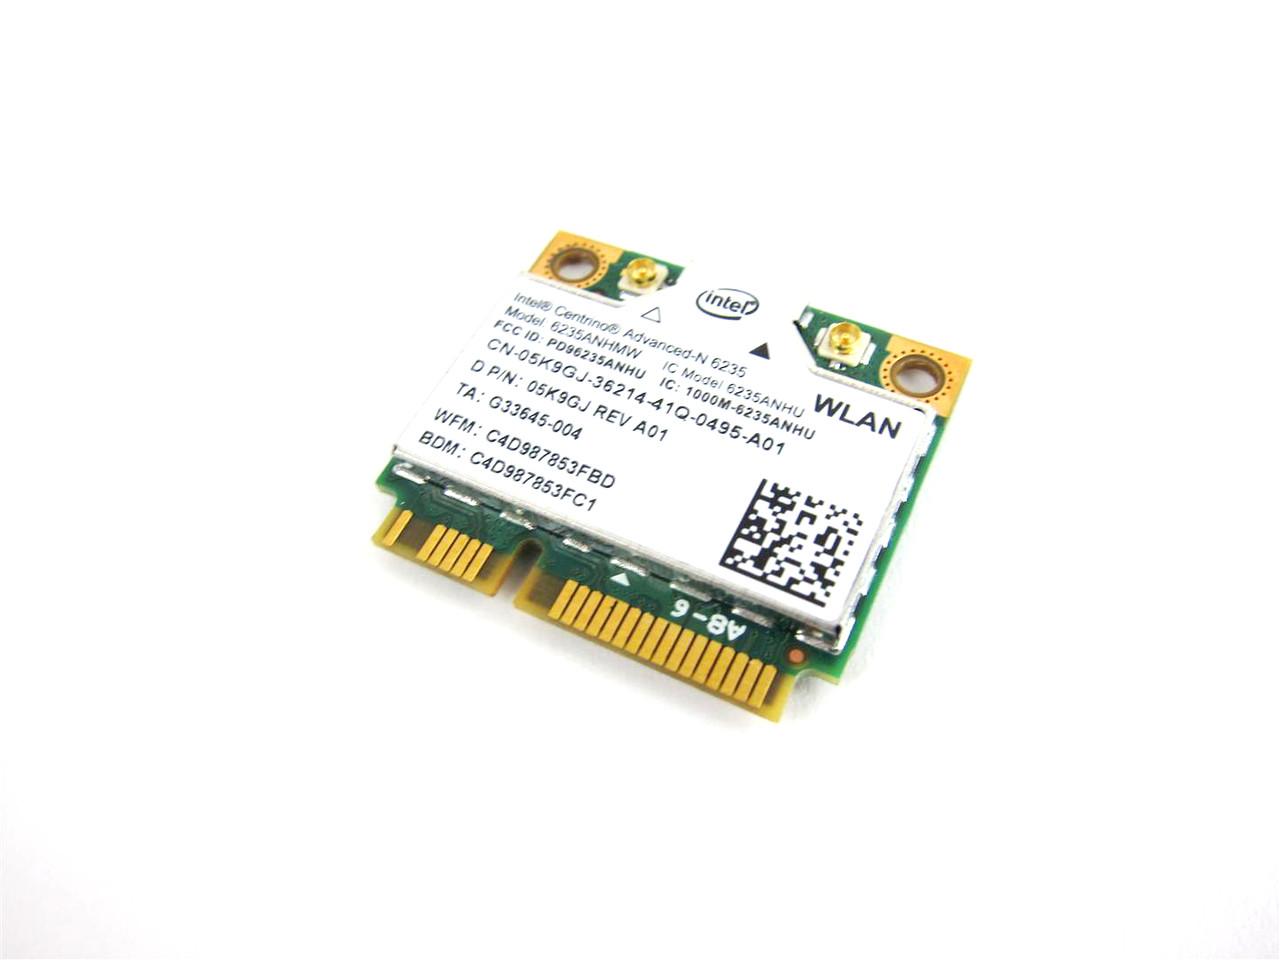 Intel Centrino Advanced-N 6235 Wifi Bluetooth 4.0 Half MINI PCI-E Card